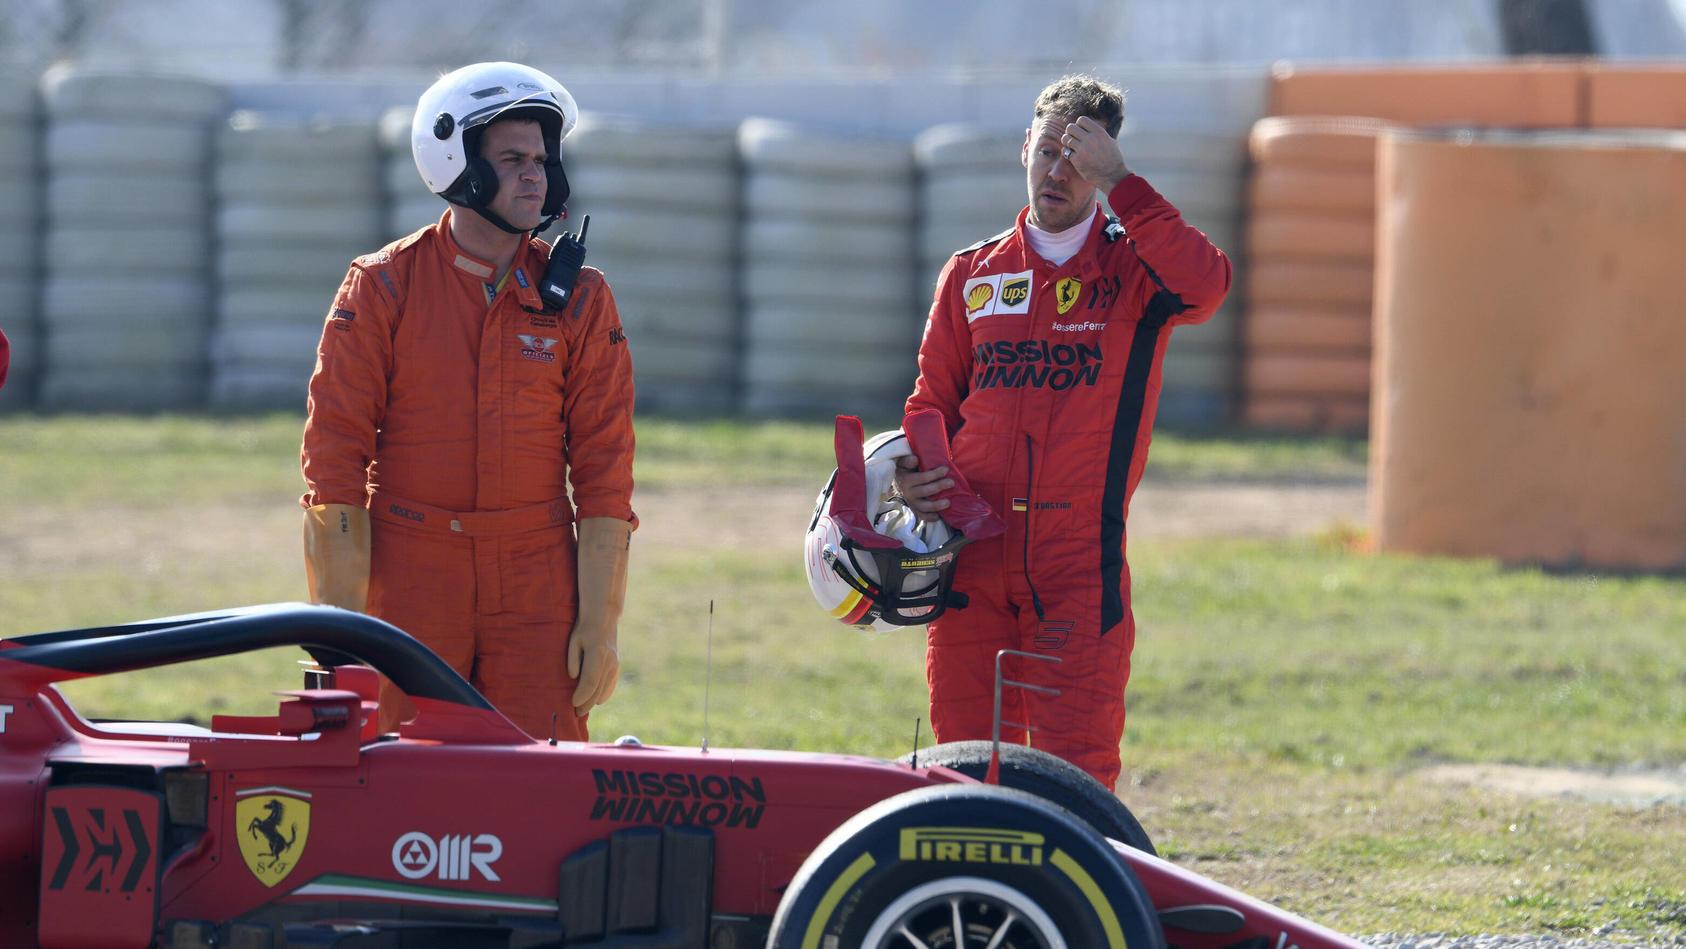 Circuit de Barcelona-Catalunya in Montmelo Spanien 21.2.2020, Formel 1 Wintertest, Sebastinan Vettel (GER), Ferrari neb